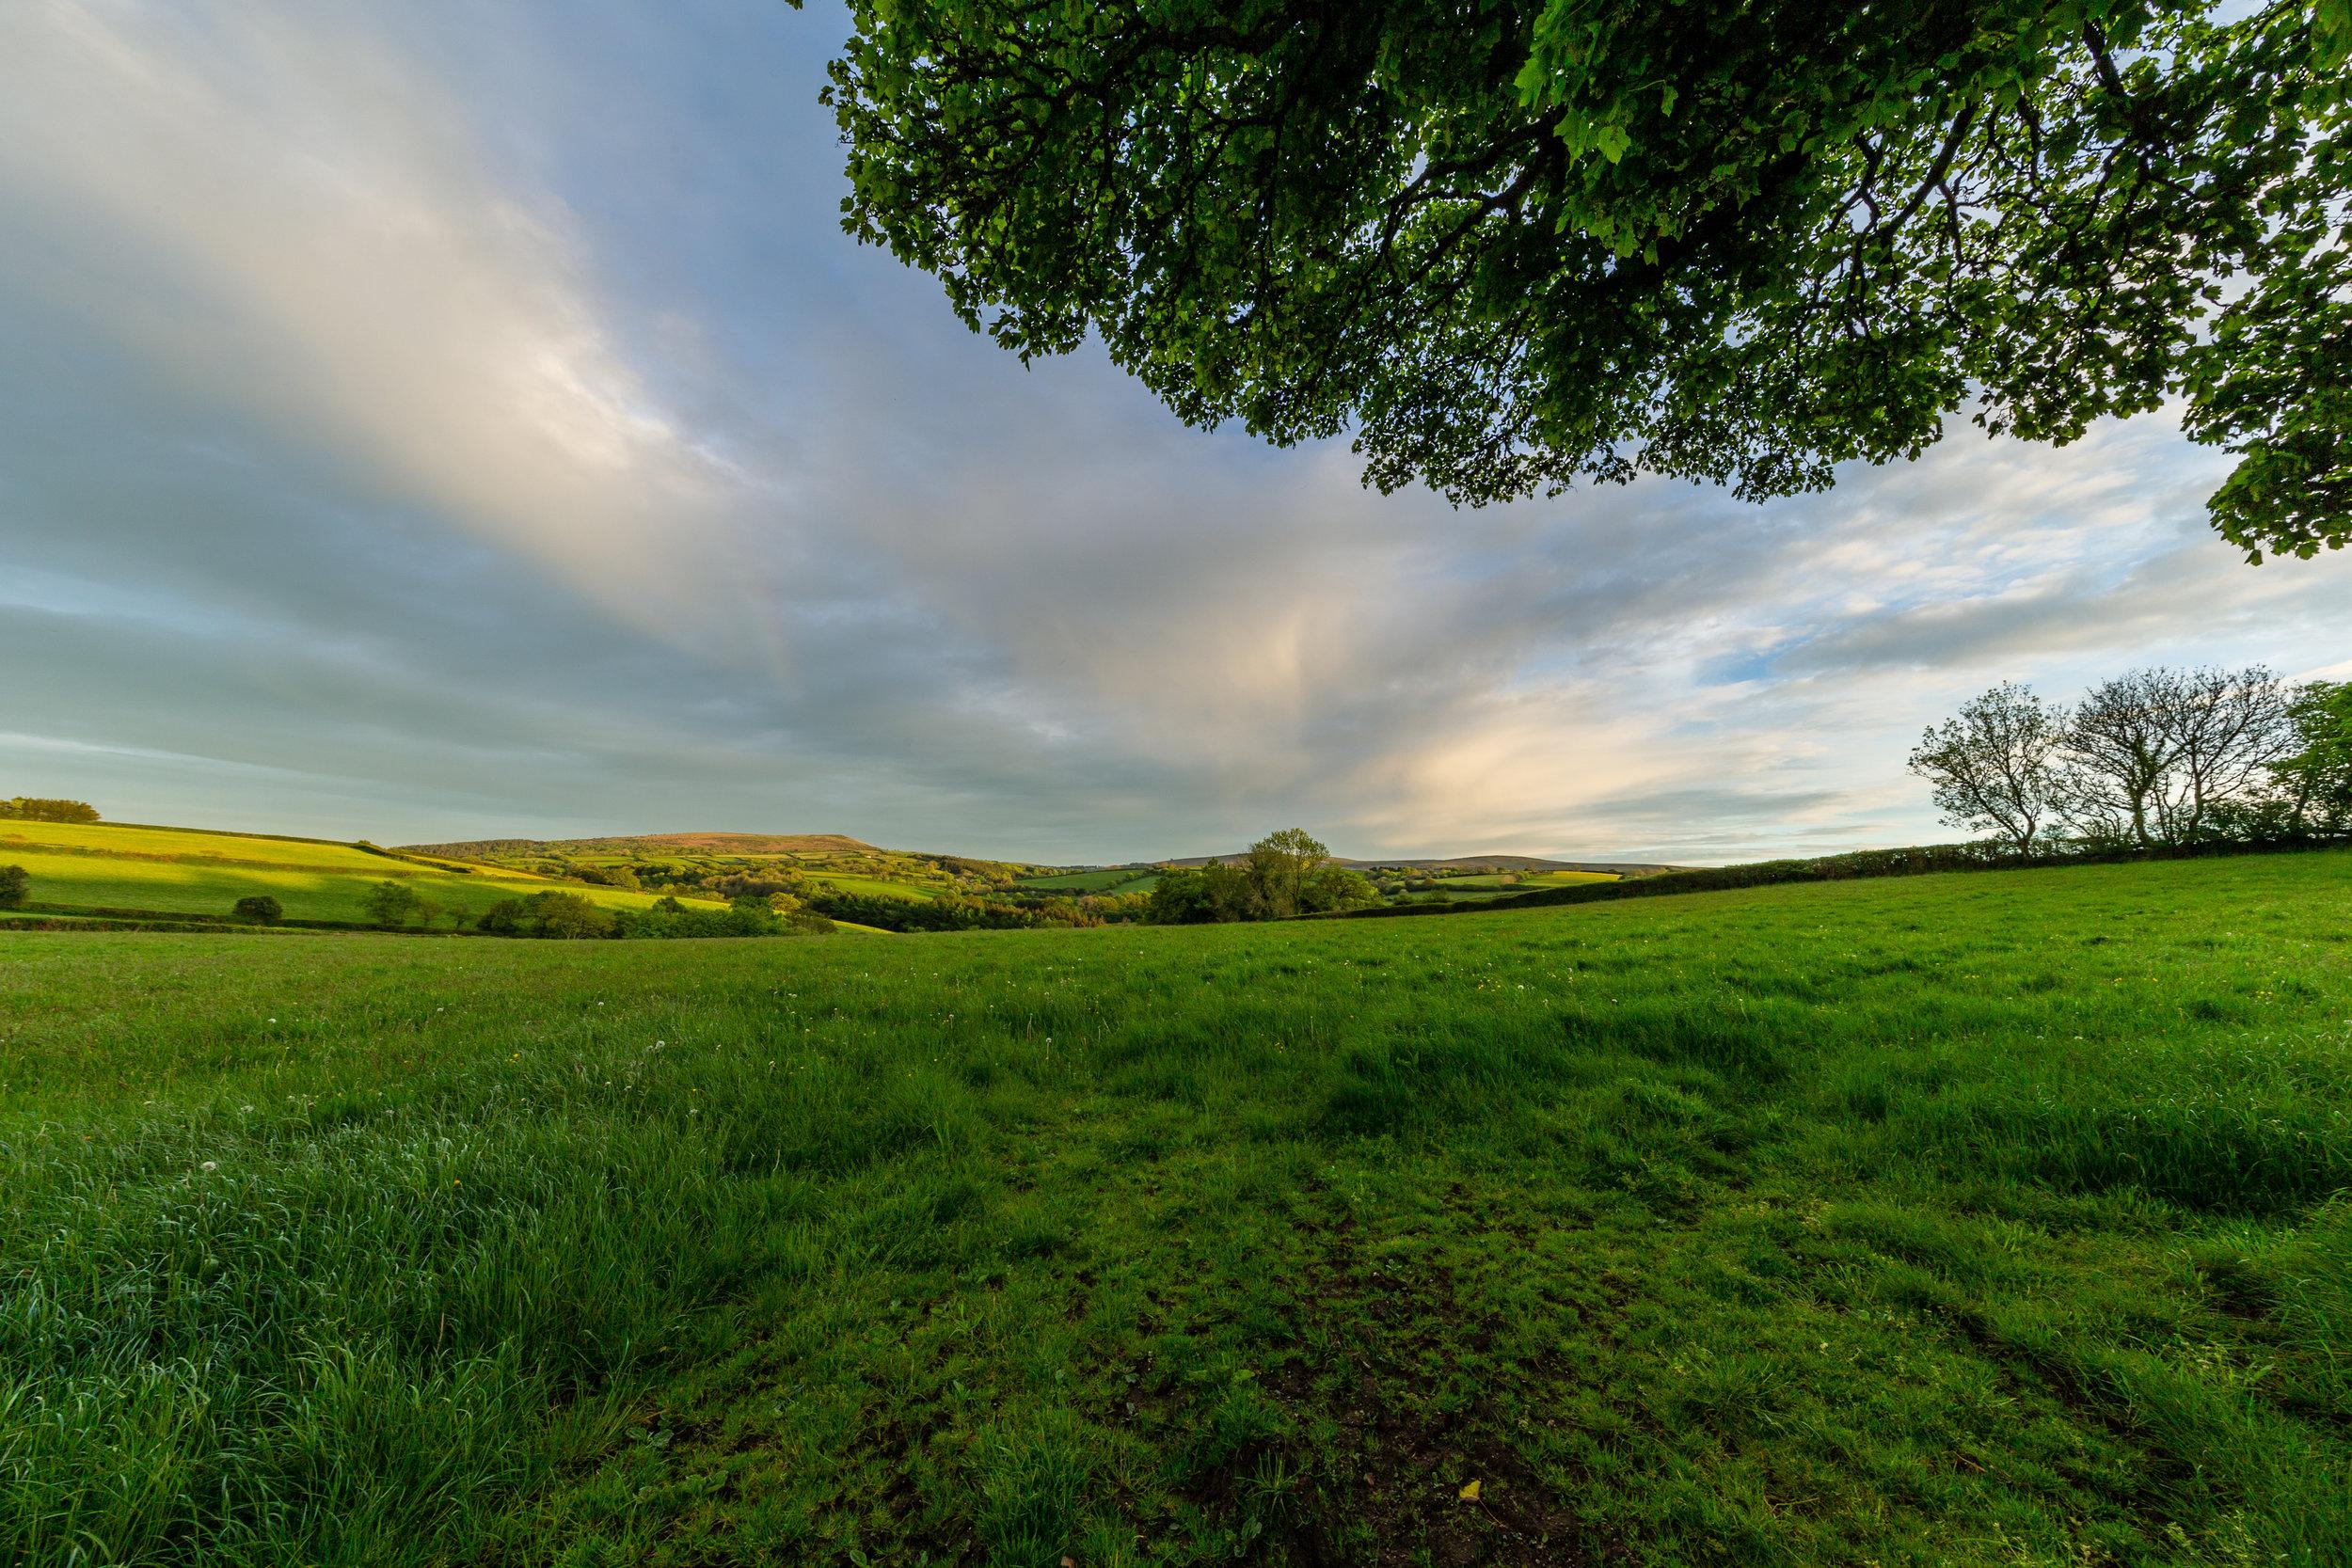 devon countryside big sky view